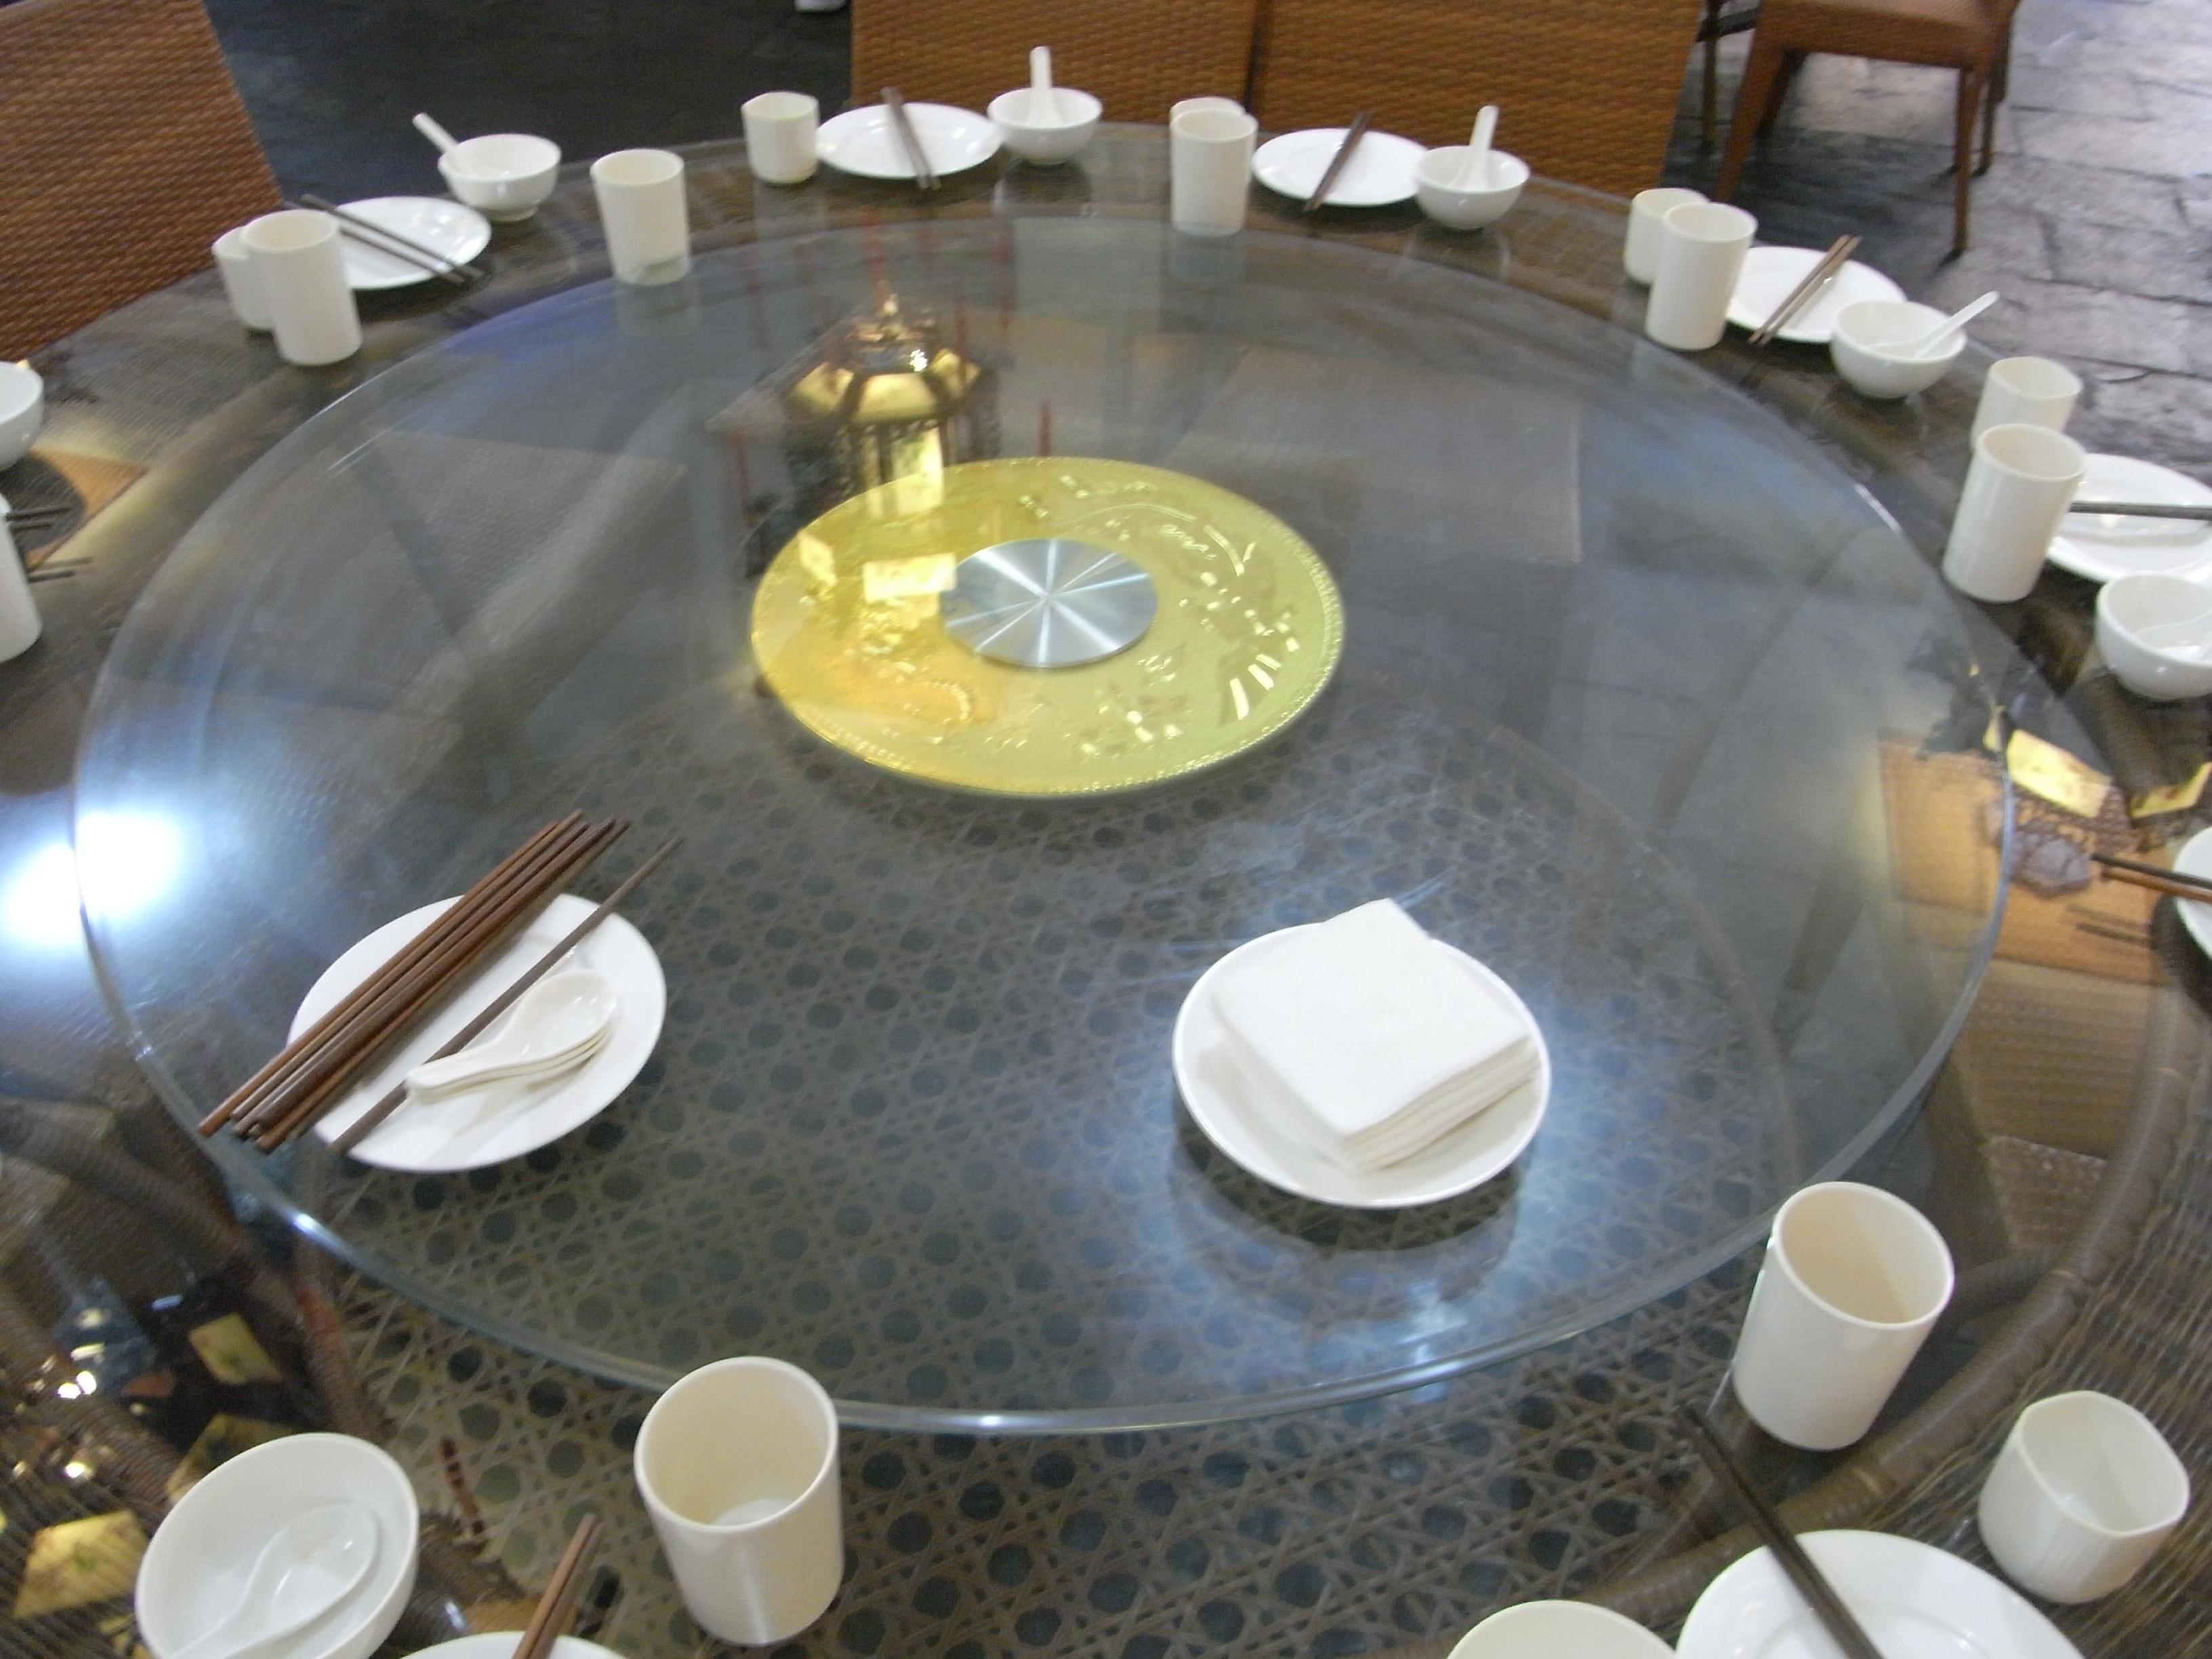 FileBJ 北京 Tour Beijing 嵗吉府餐廳 restaurant Chinese table setting Aug- & File:BJ 北京 Tour Beijing 嵗吉府餐廳 restaurant Chinese table ...